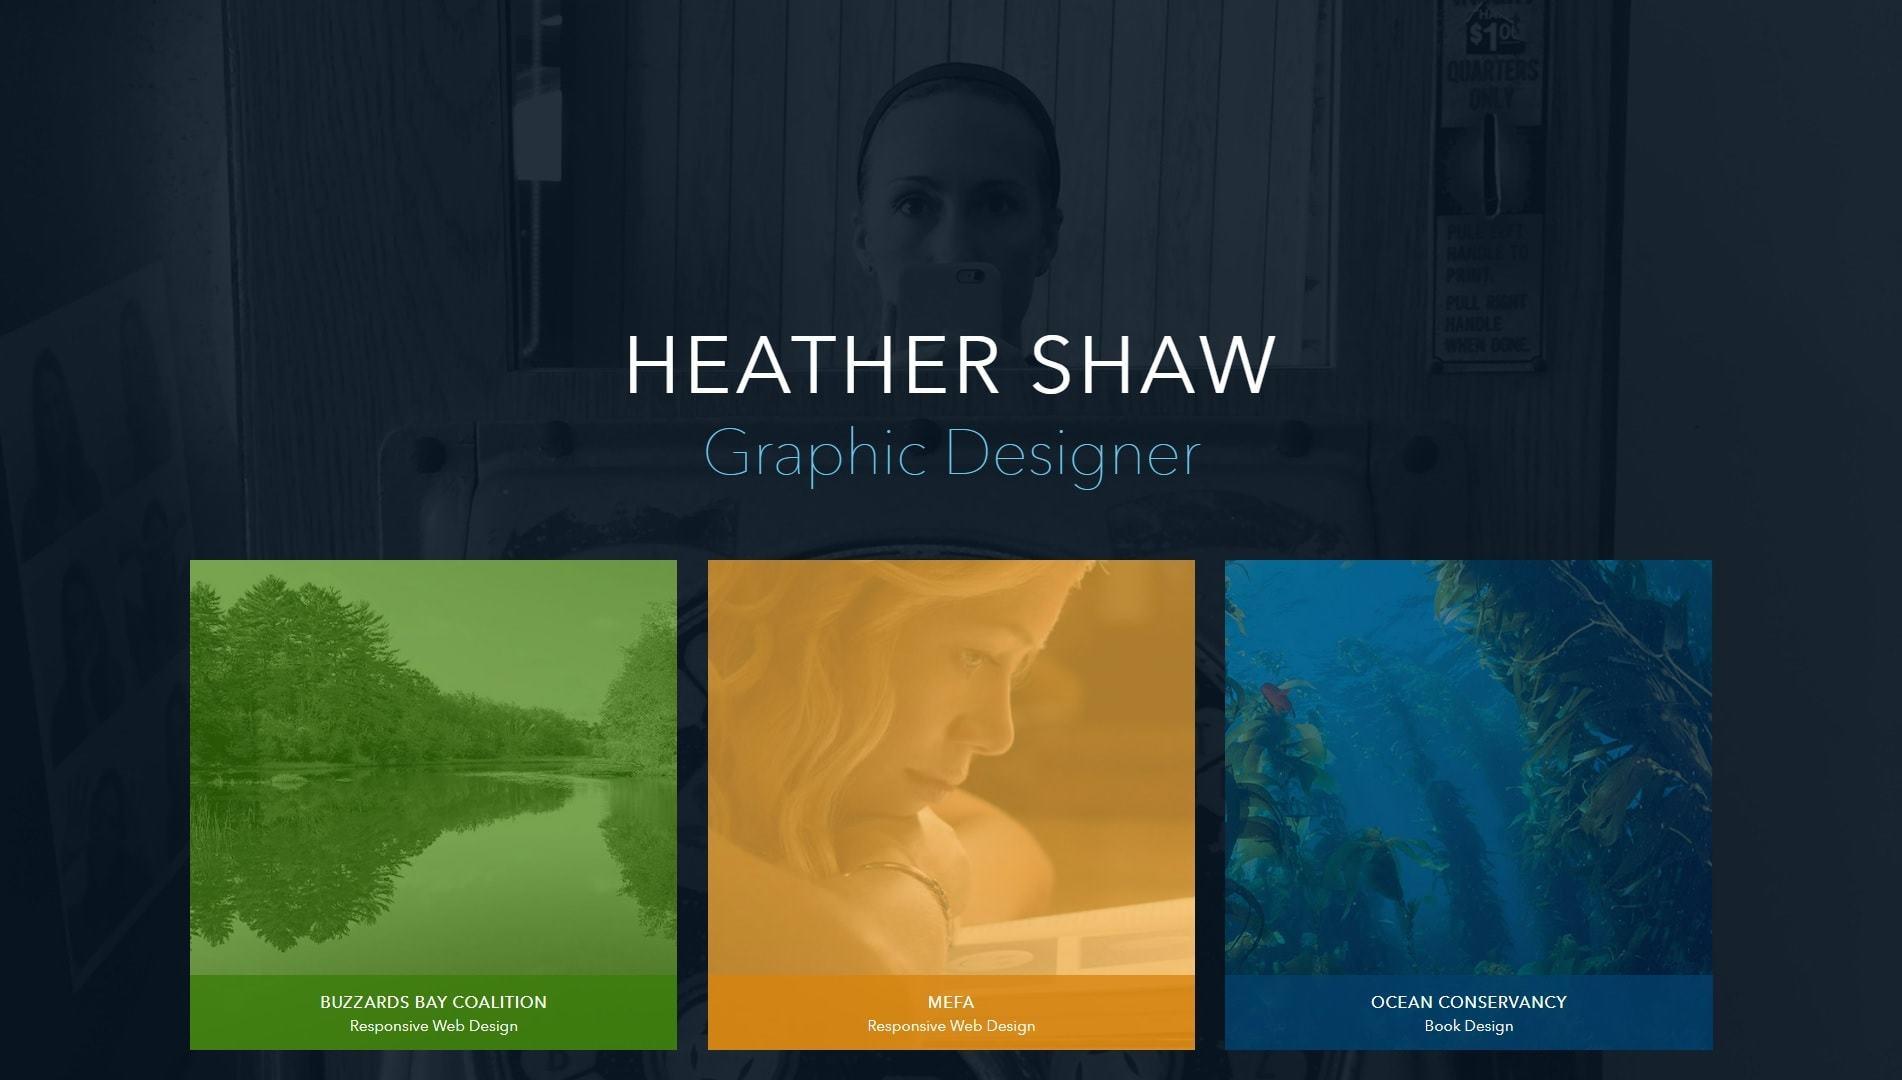 Heather Shaw